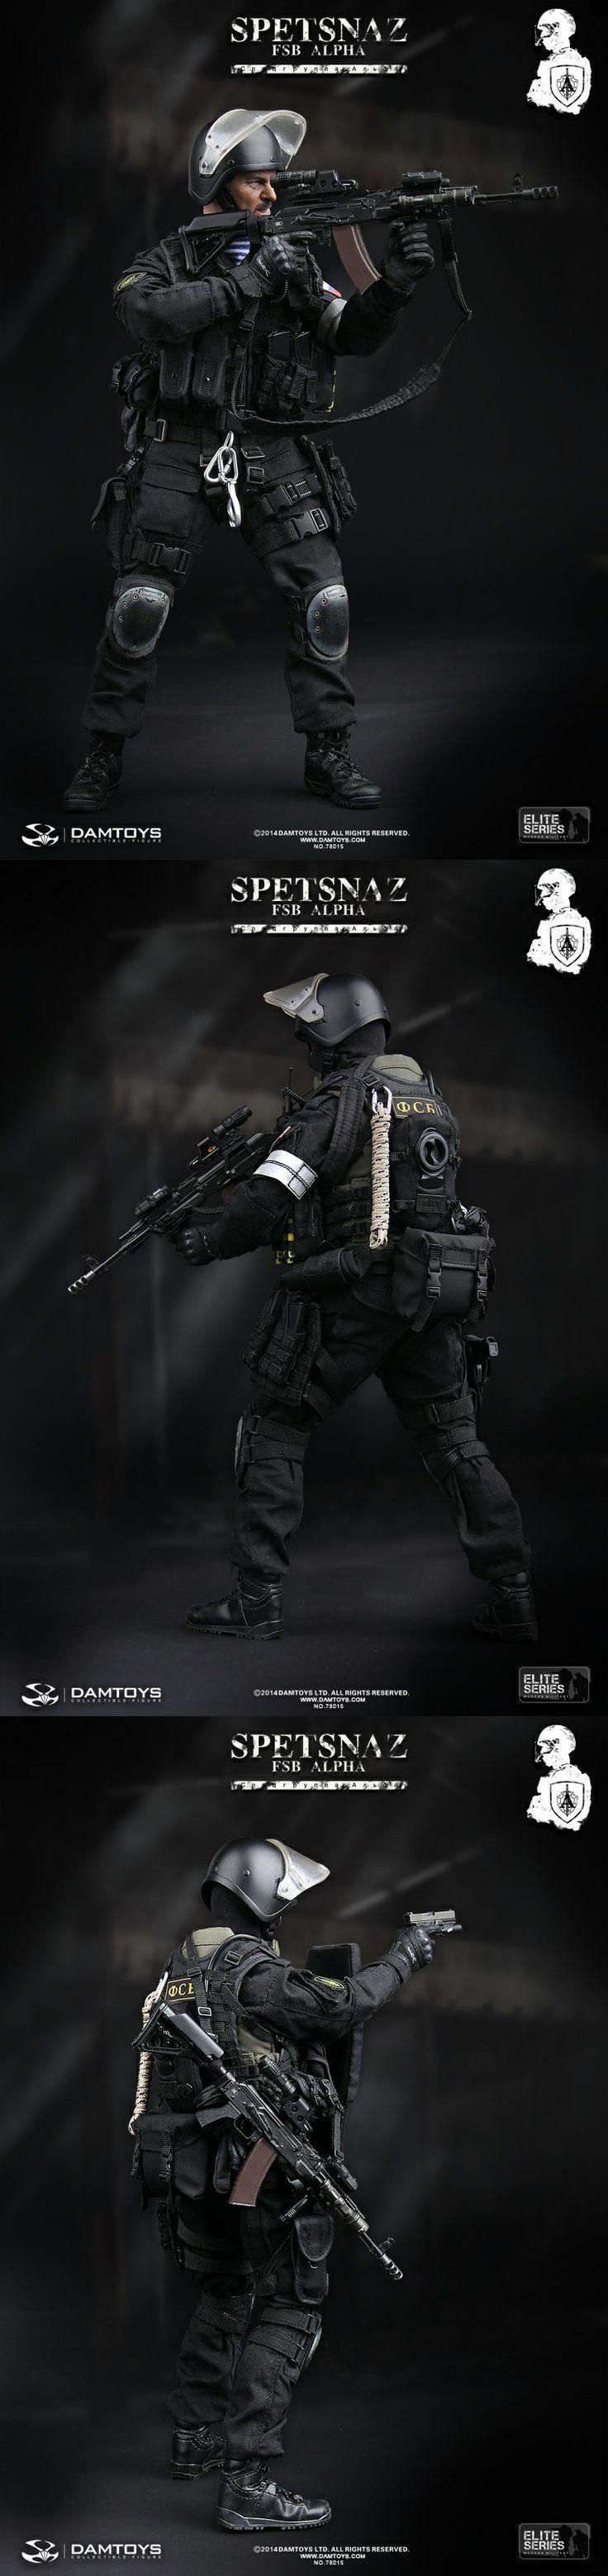 DAMTOYS_78015_SPETSNAZ FSB ALPHA GROUP